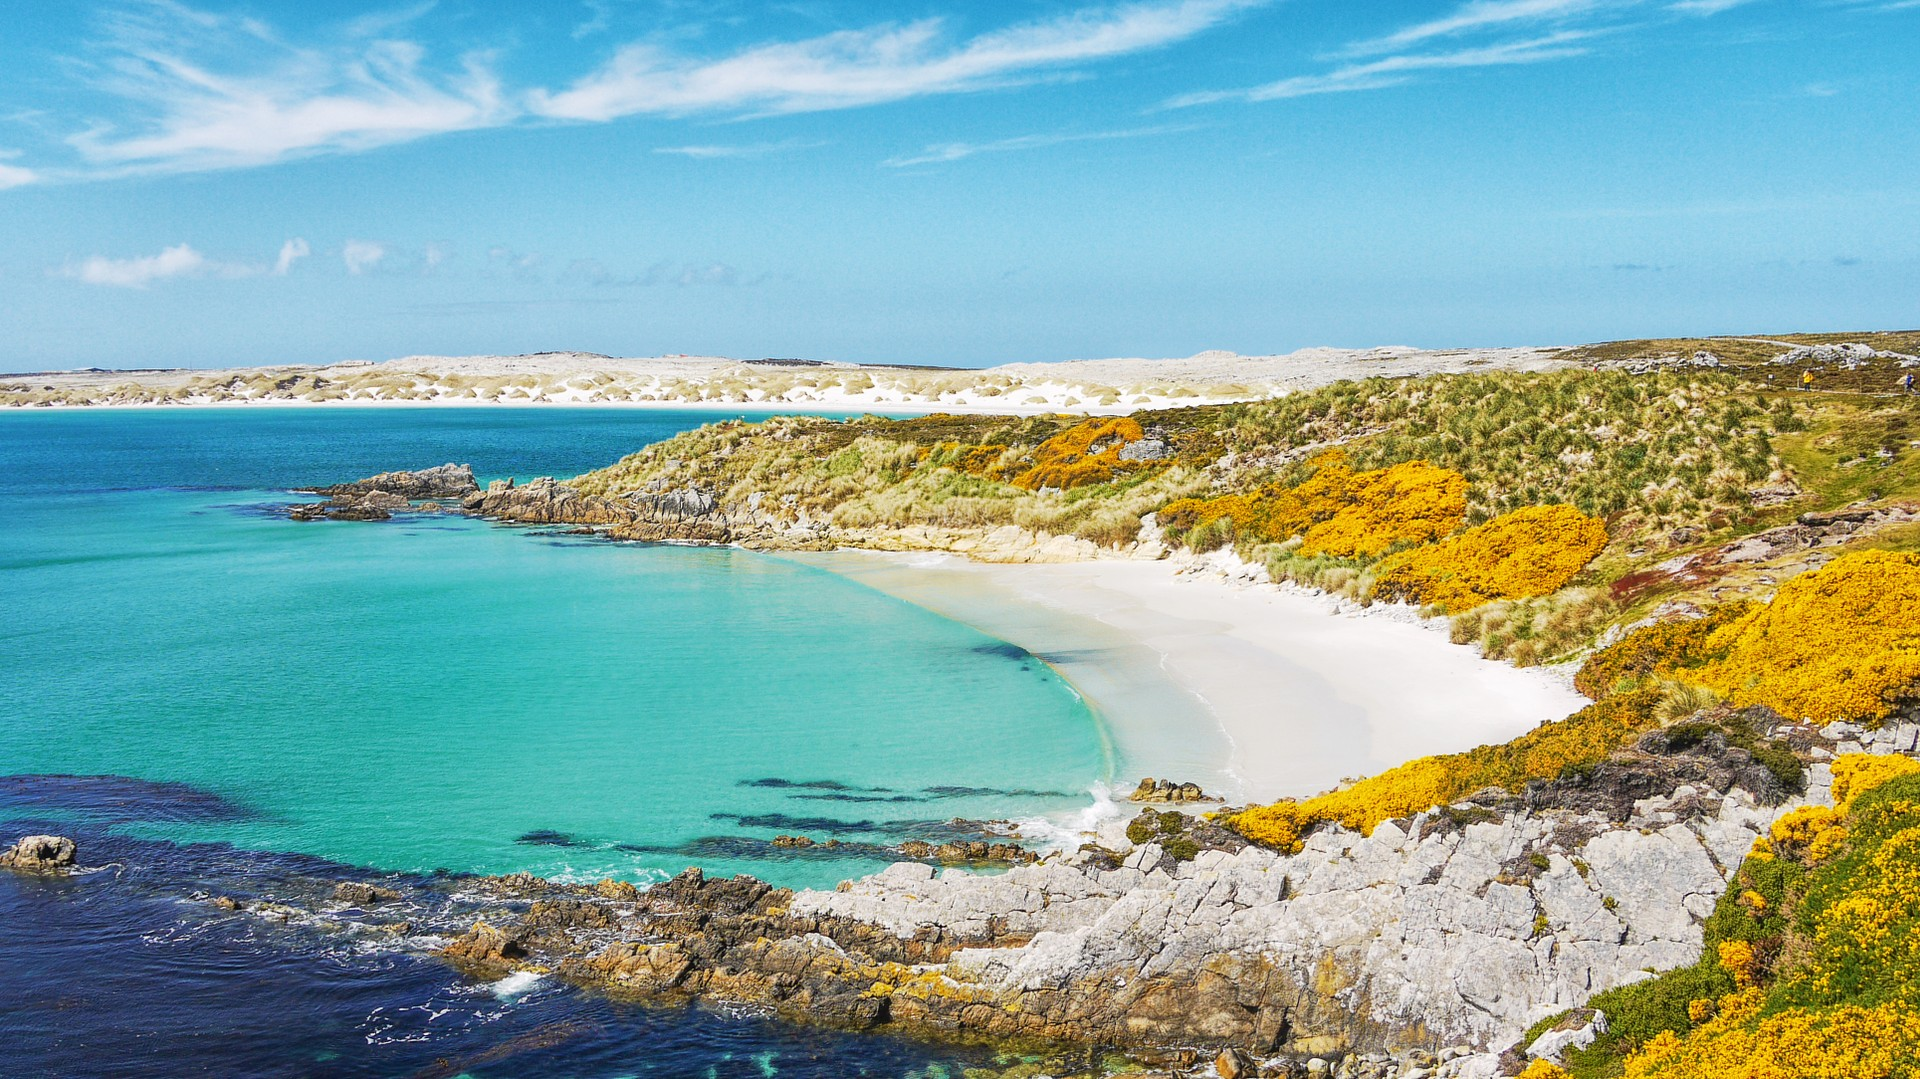 Gypsy Cove Falkland Islands